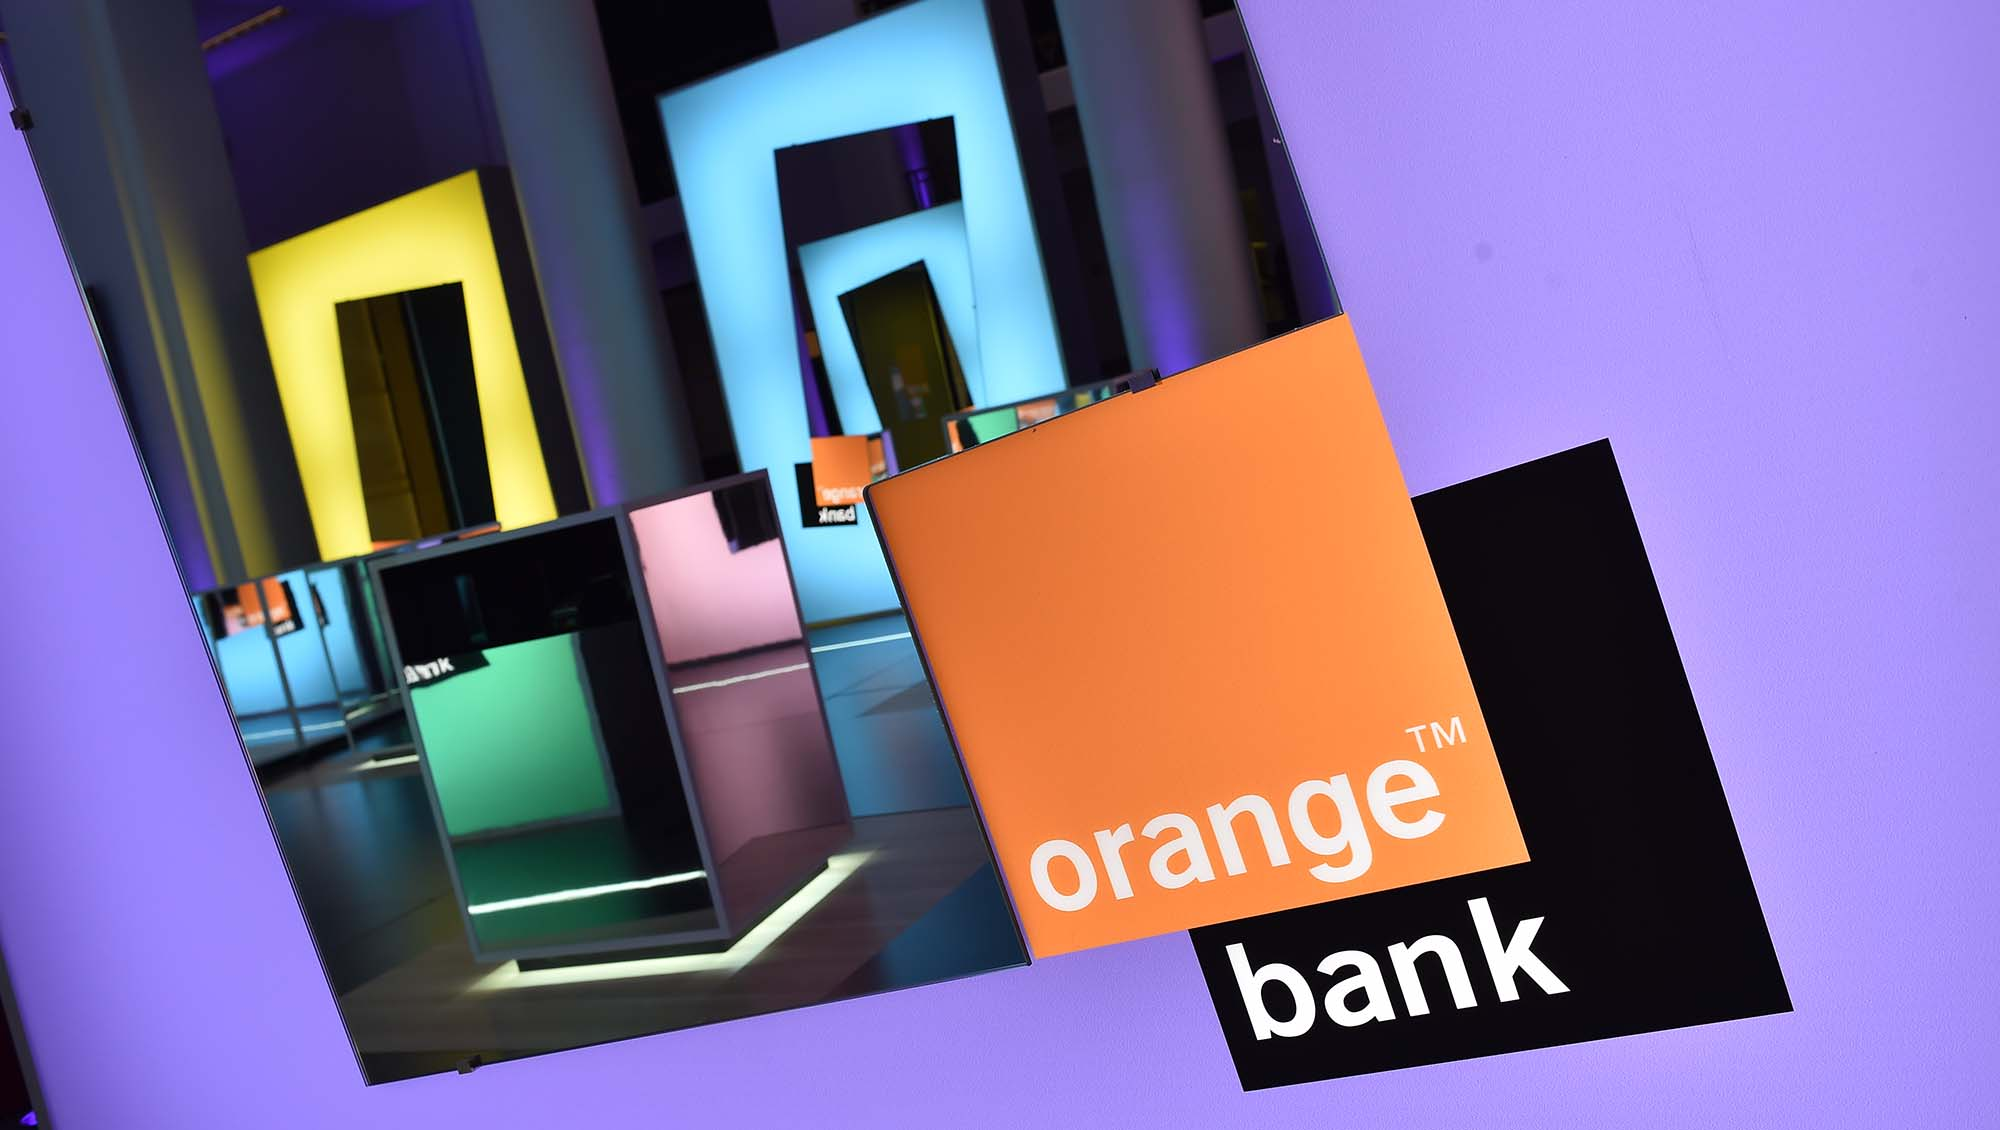 credit immobilier orange bank